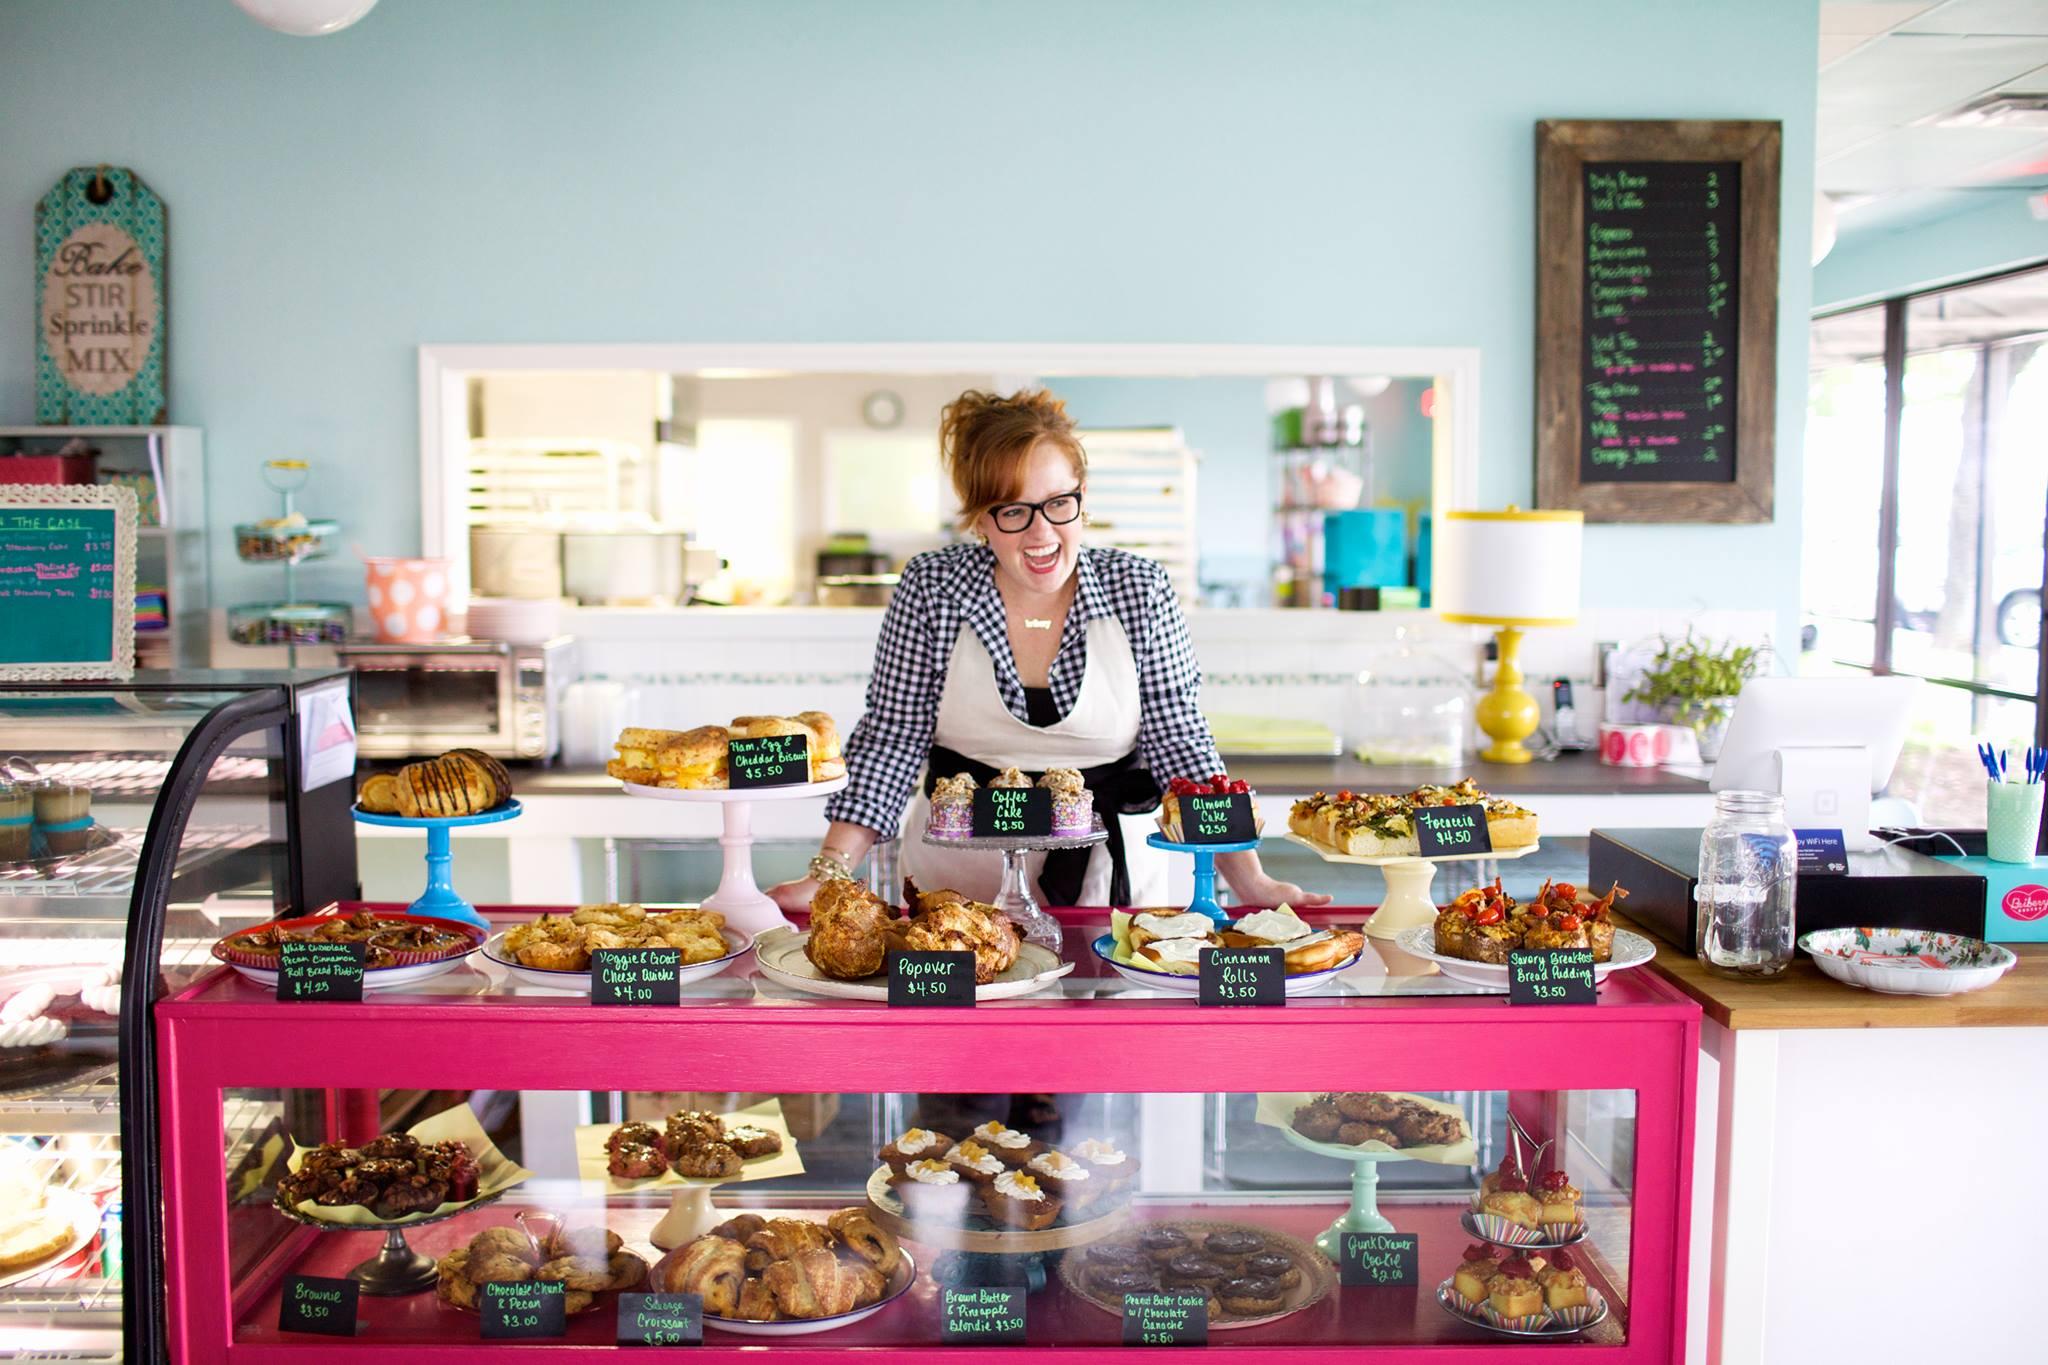 Jodi Elliott at Bribery Bakery in Wells Branch